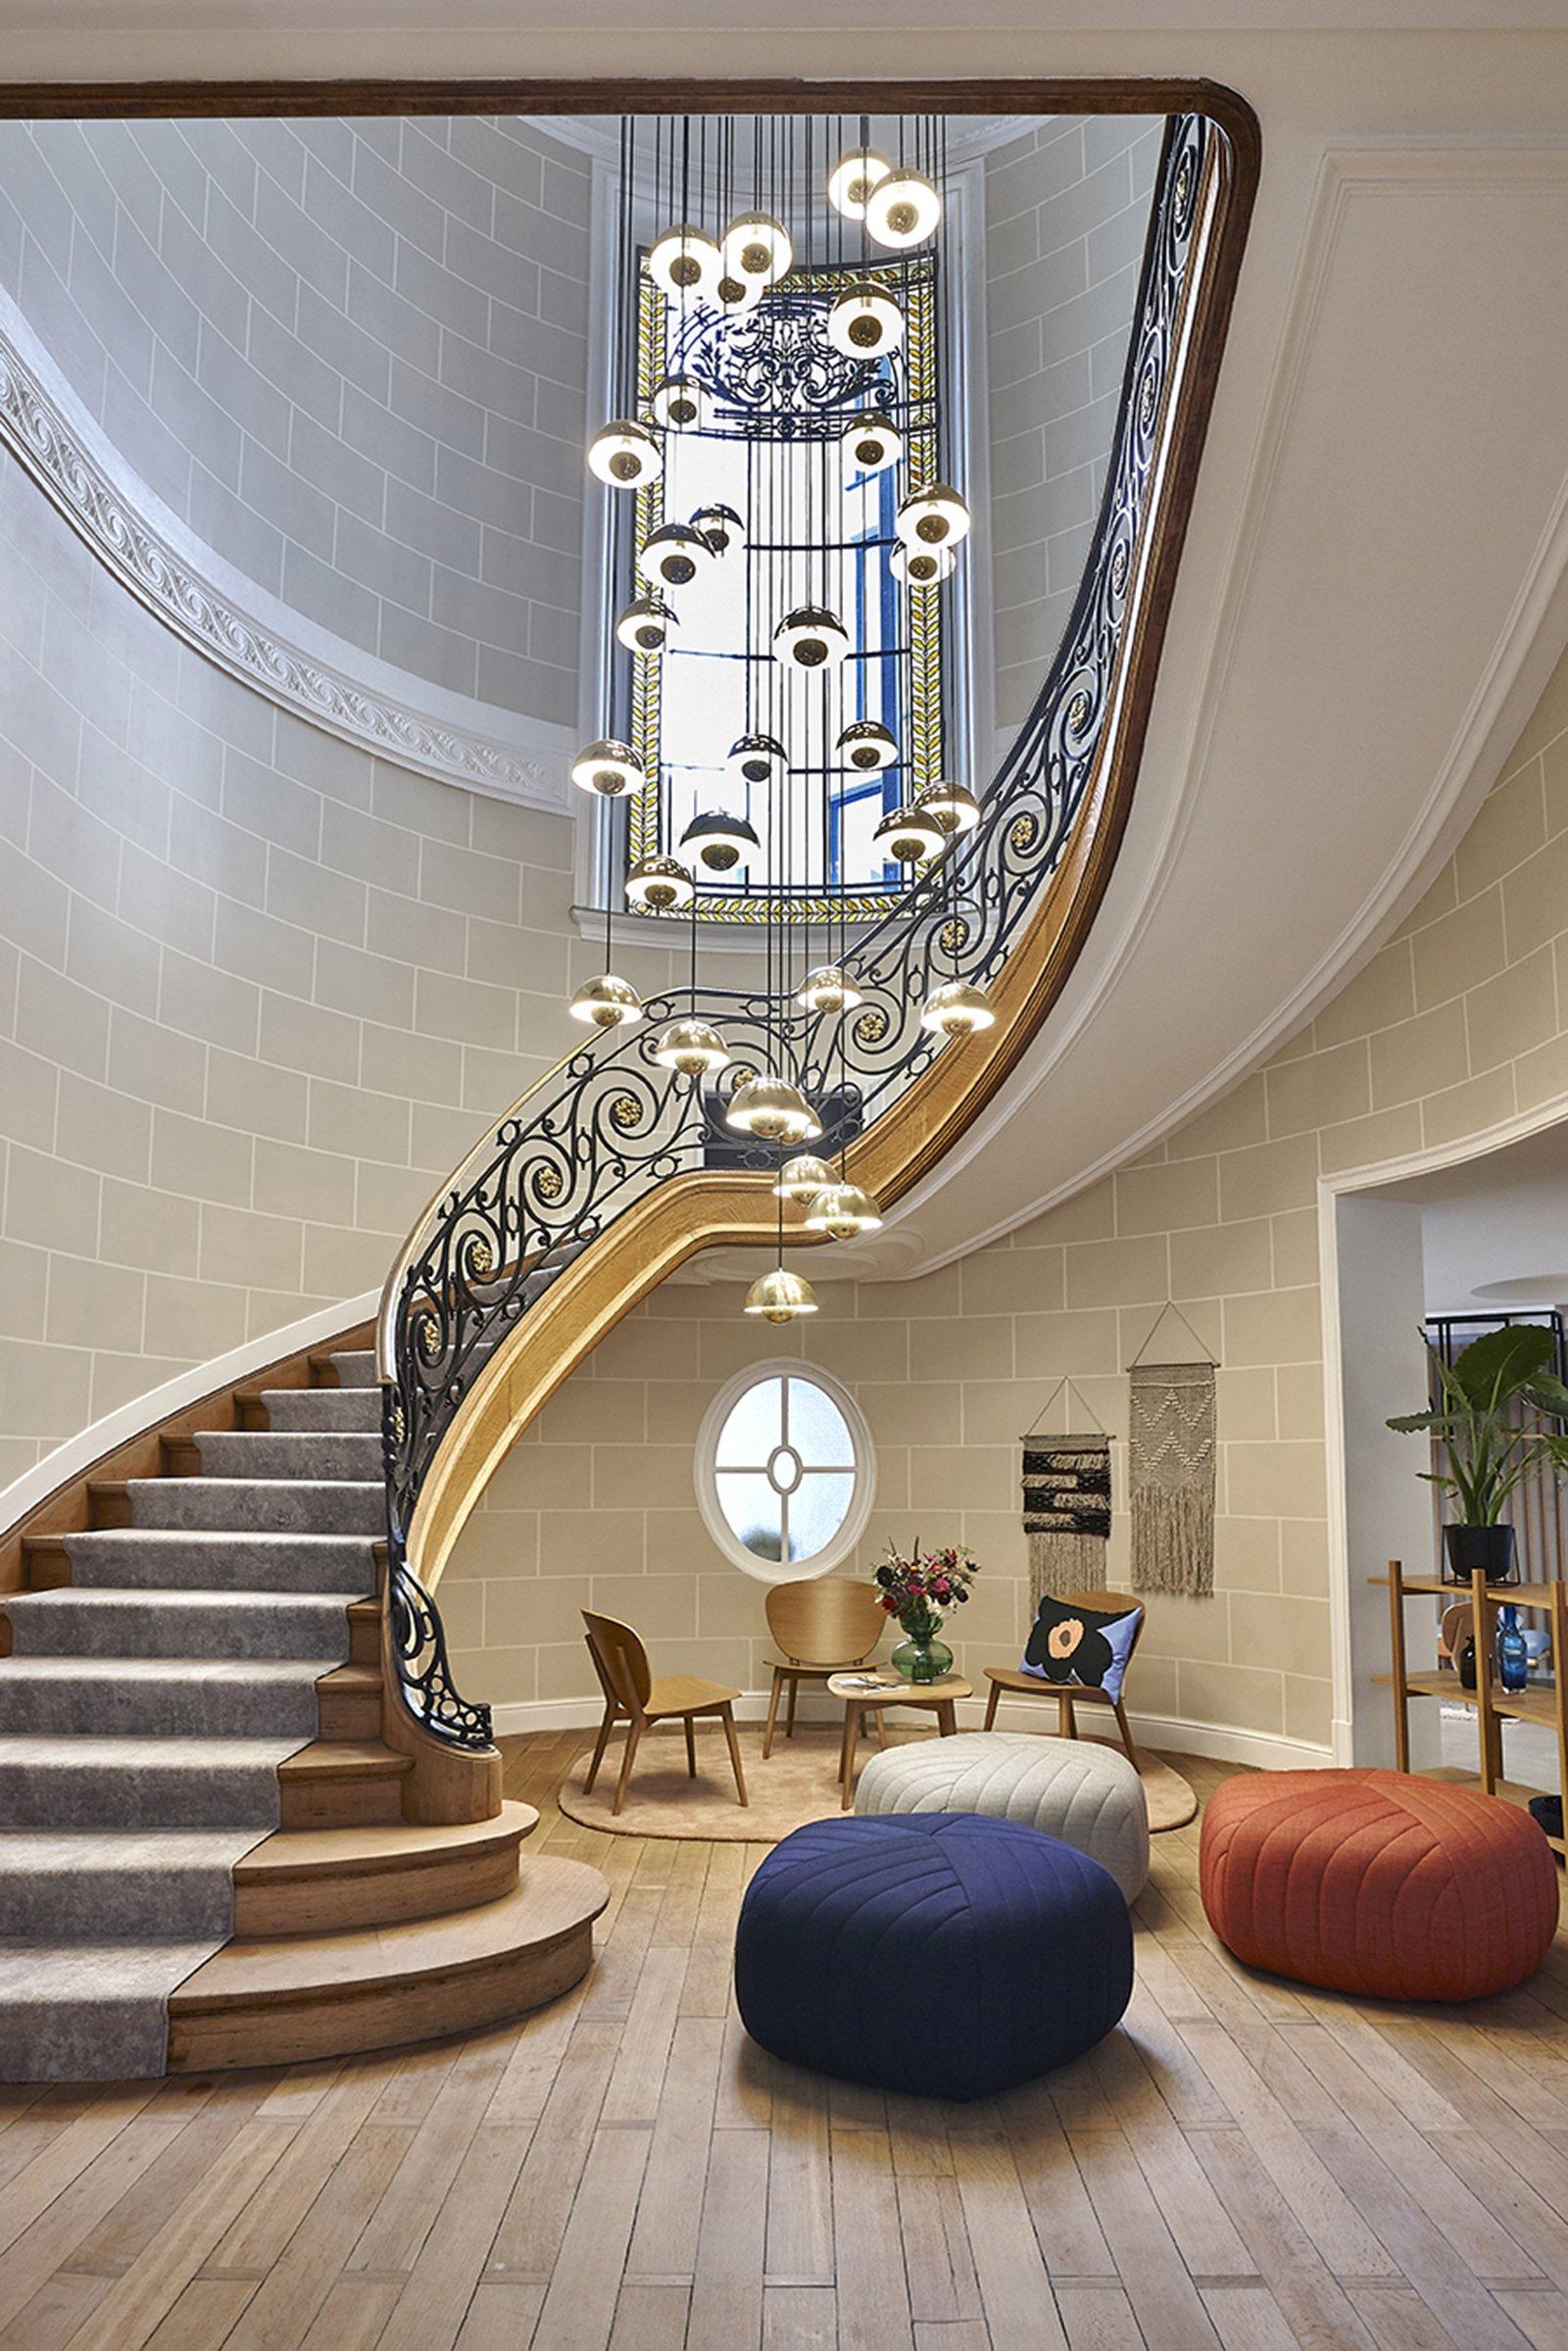 hygge hotel brussels belgium hallway stairs